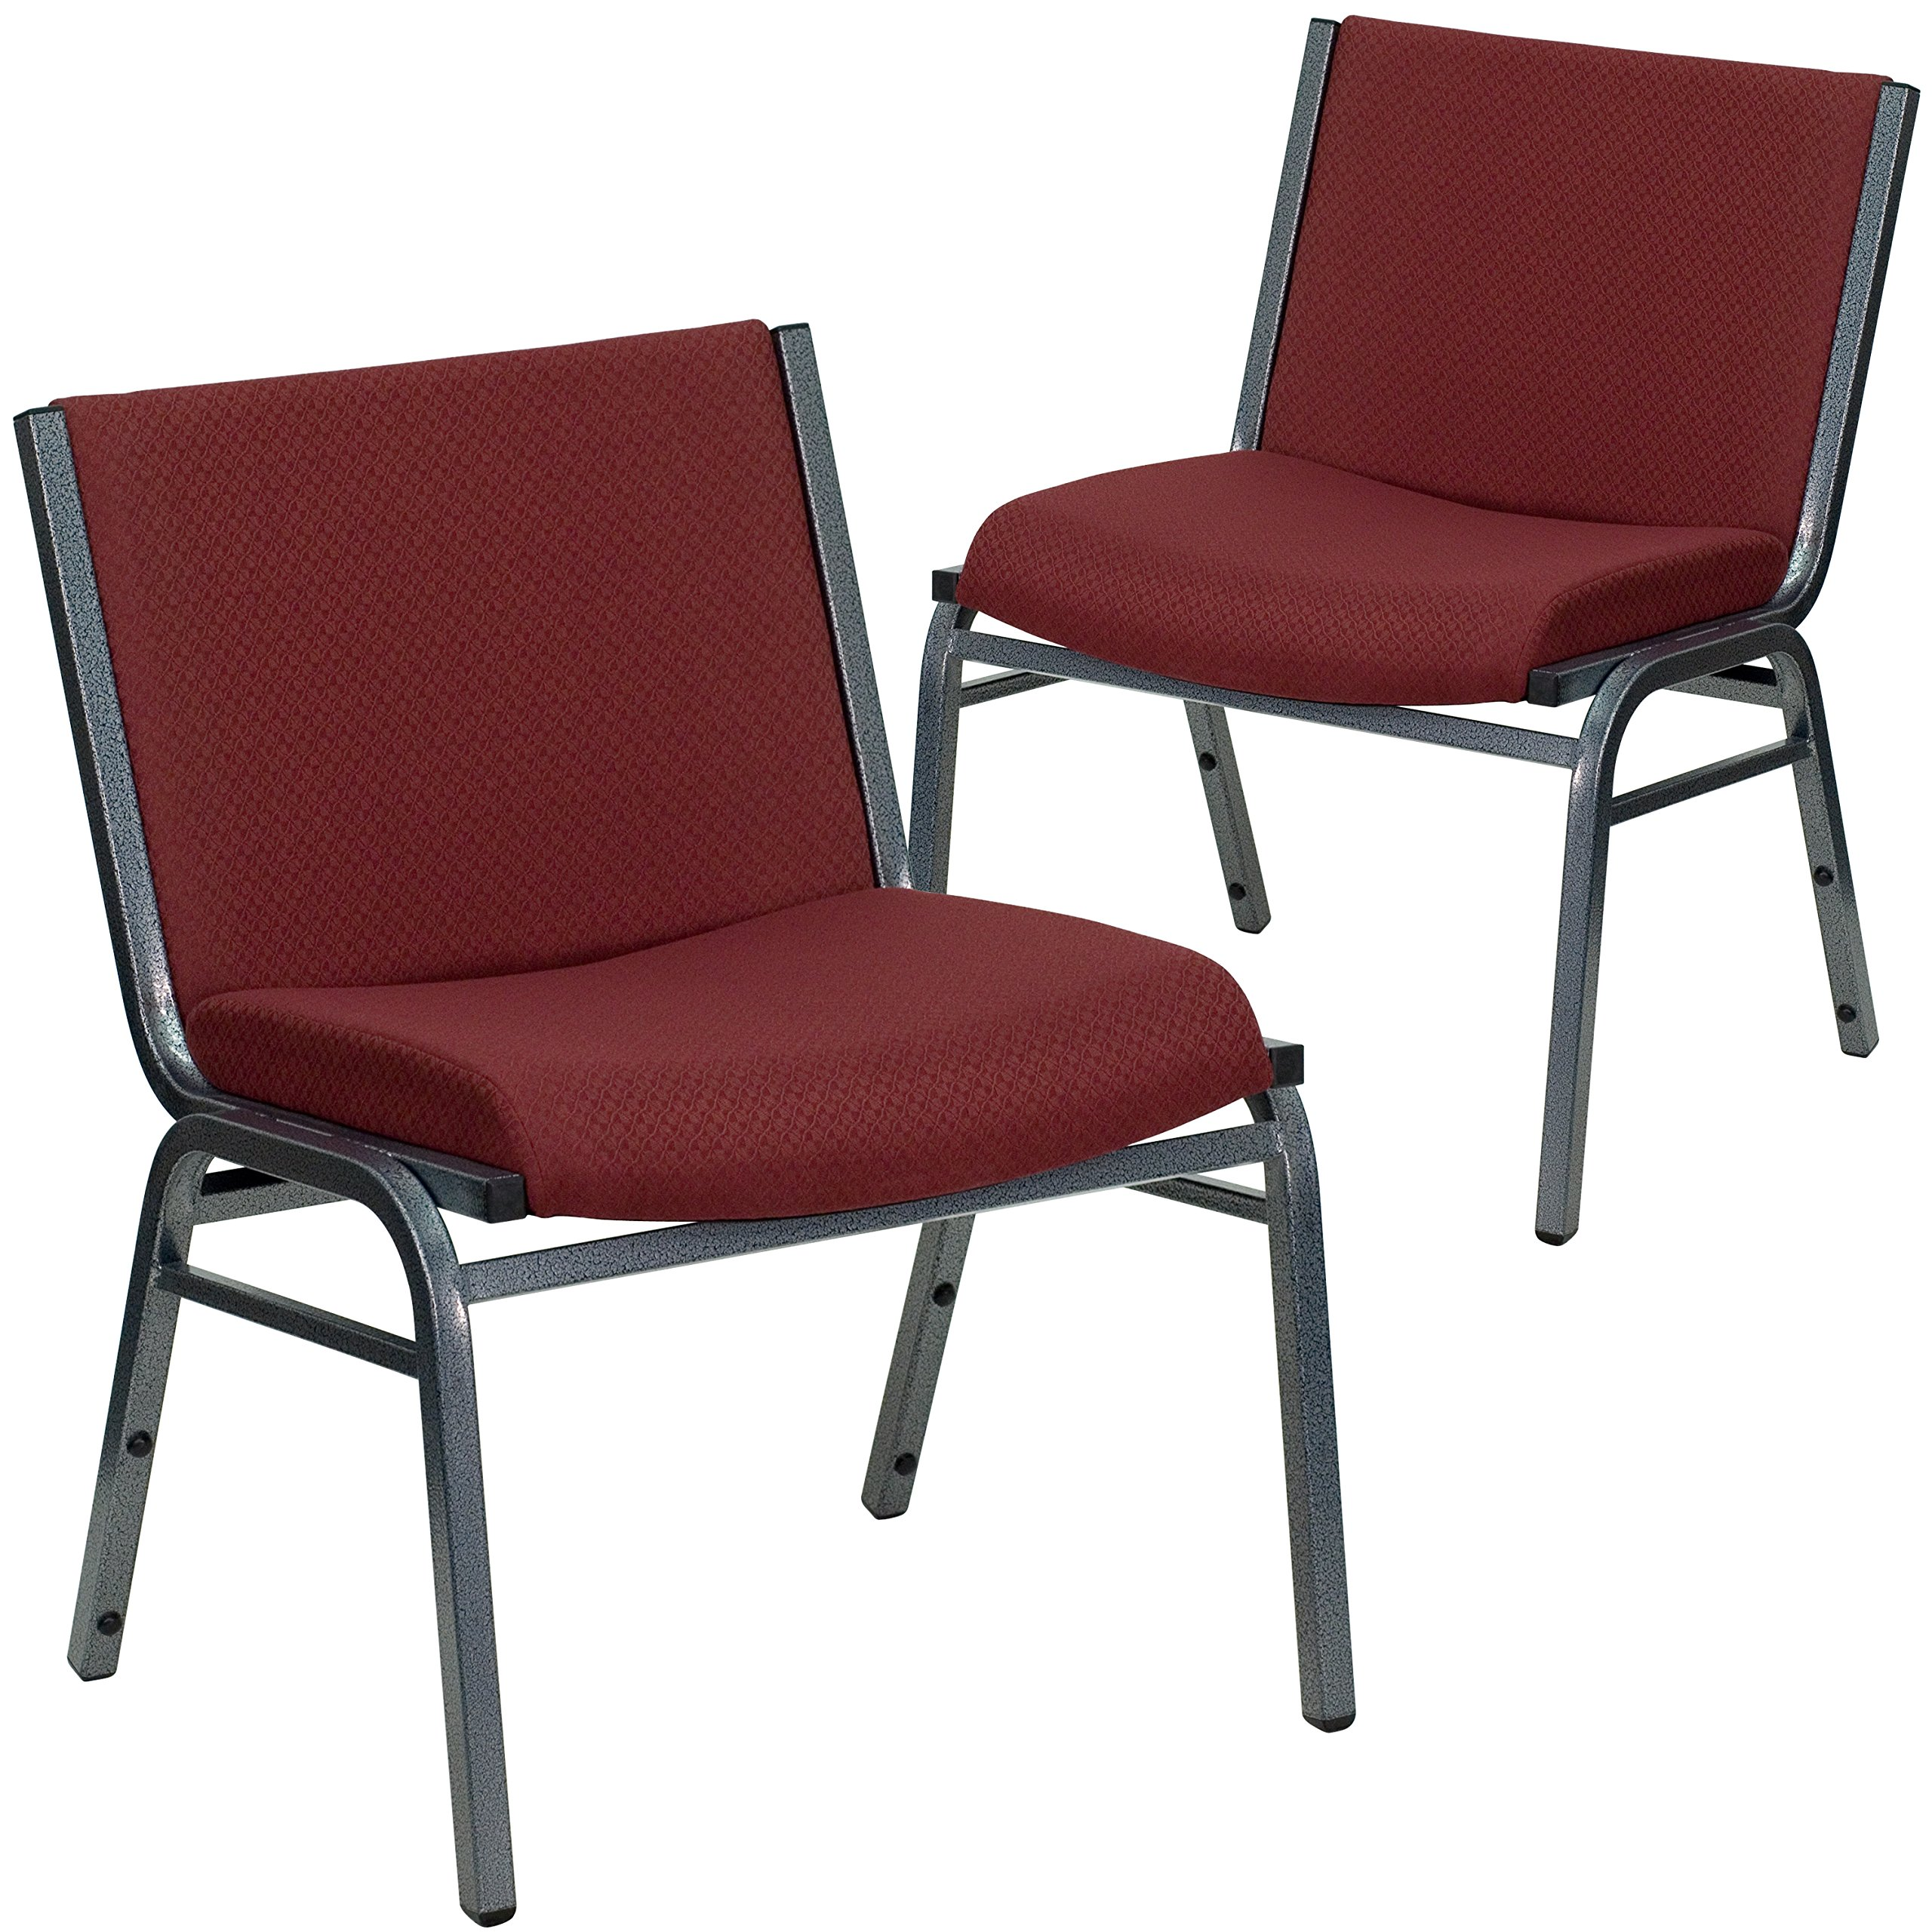 Flash Furniture 2 Pk. HERCULES Series Big & Tall 1000 lb. Rated Burgundy Fabric Stack Chair